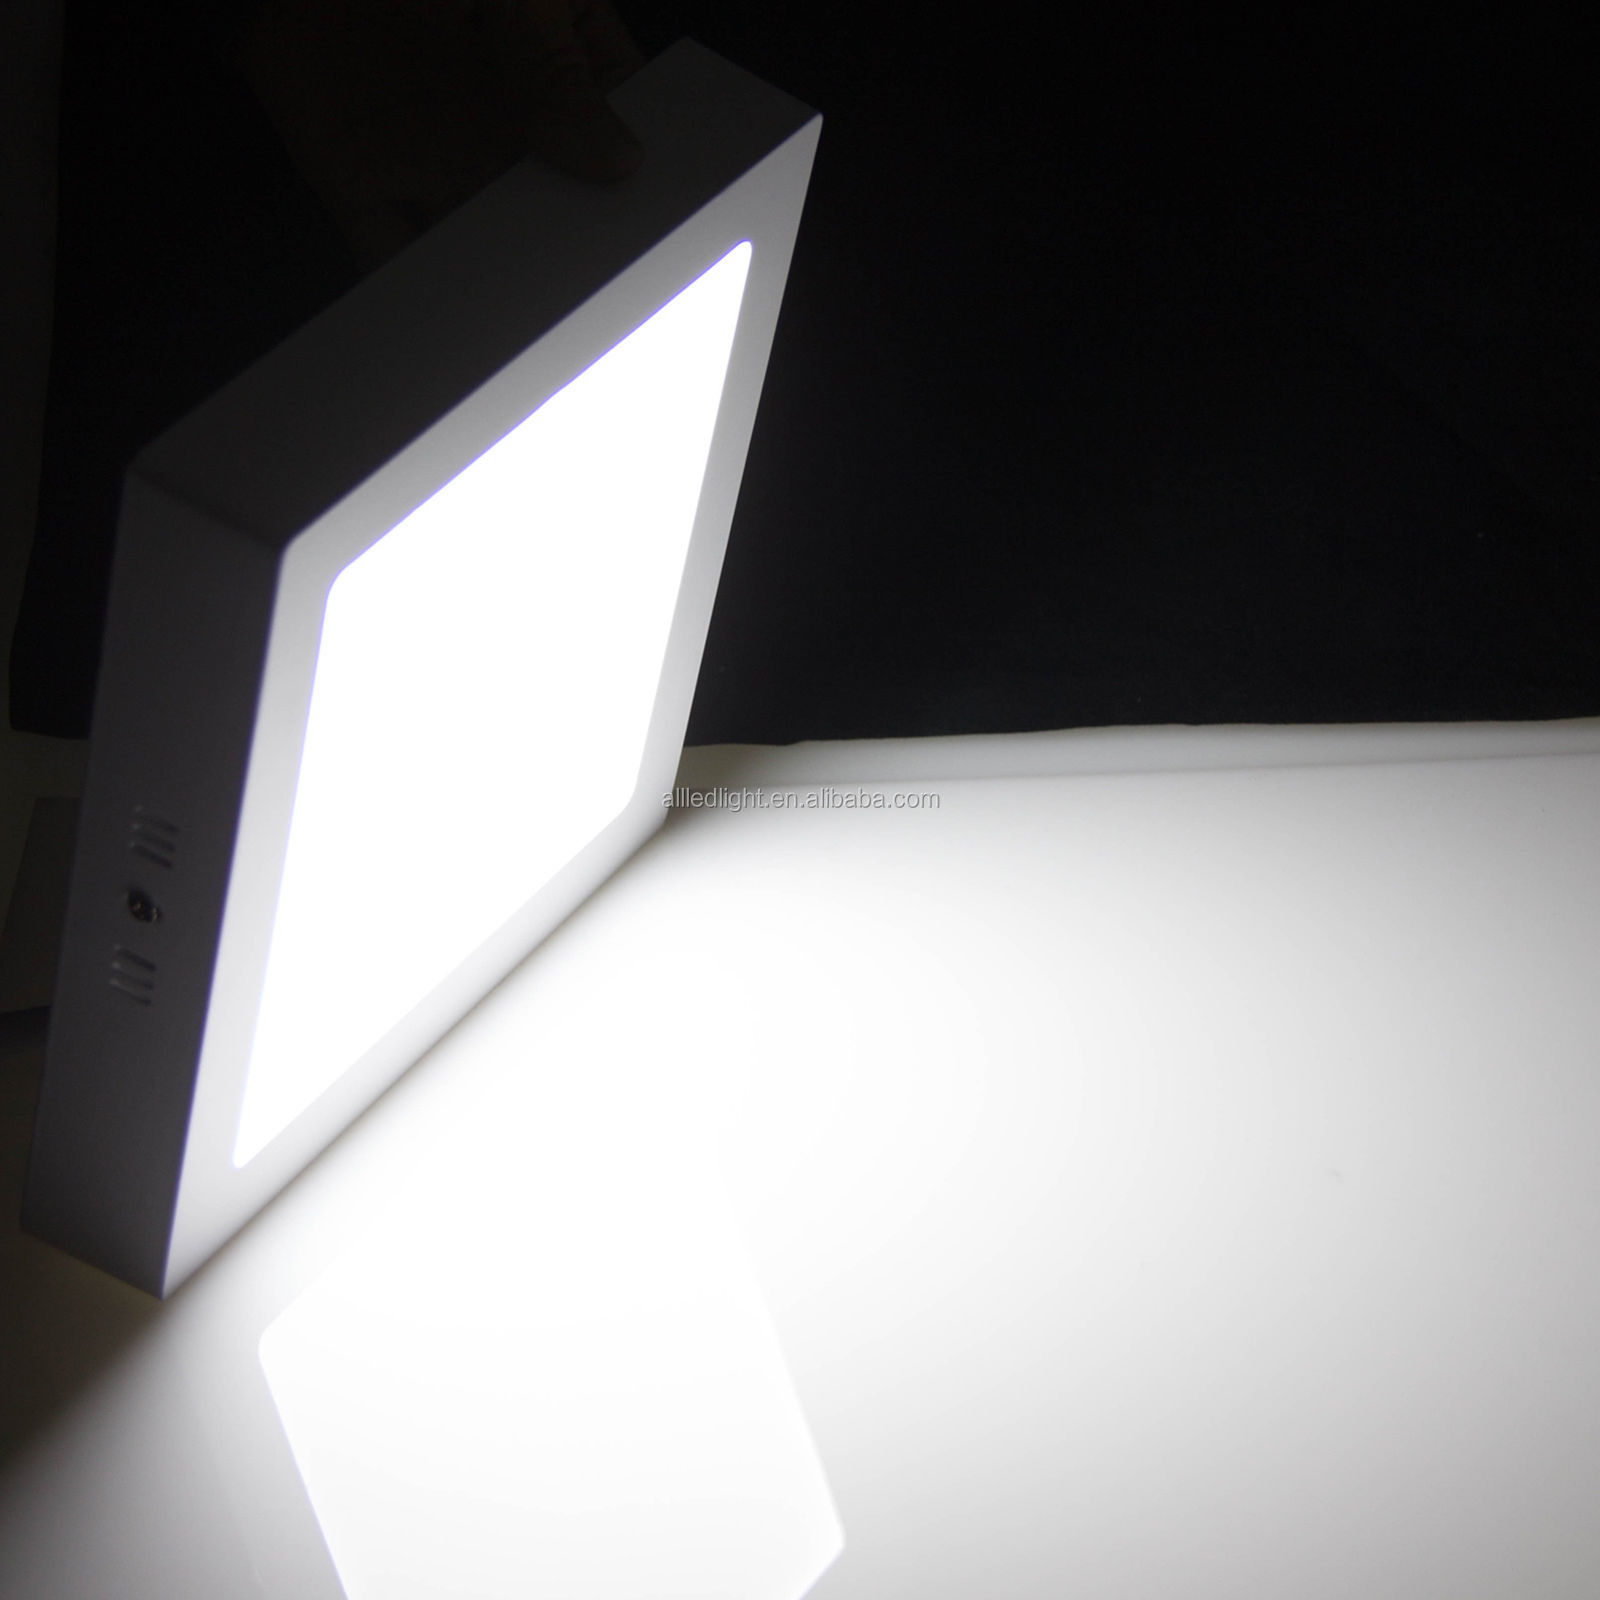 6w led panel light surface mount roundsquare ceiling down light 6w led panel light surface mount roundsquare ceiling down light dailygadgetfo Choice Image